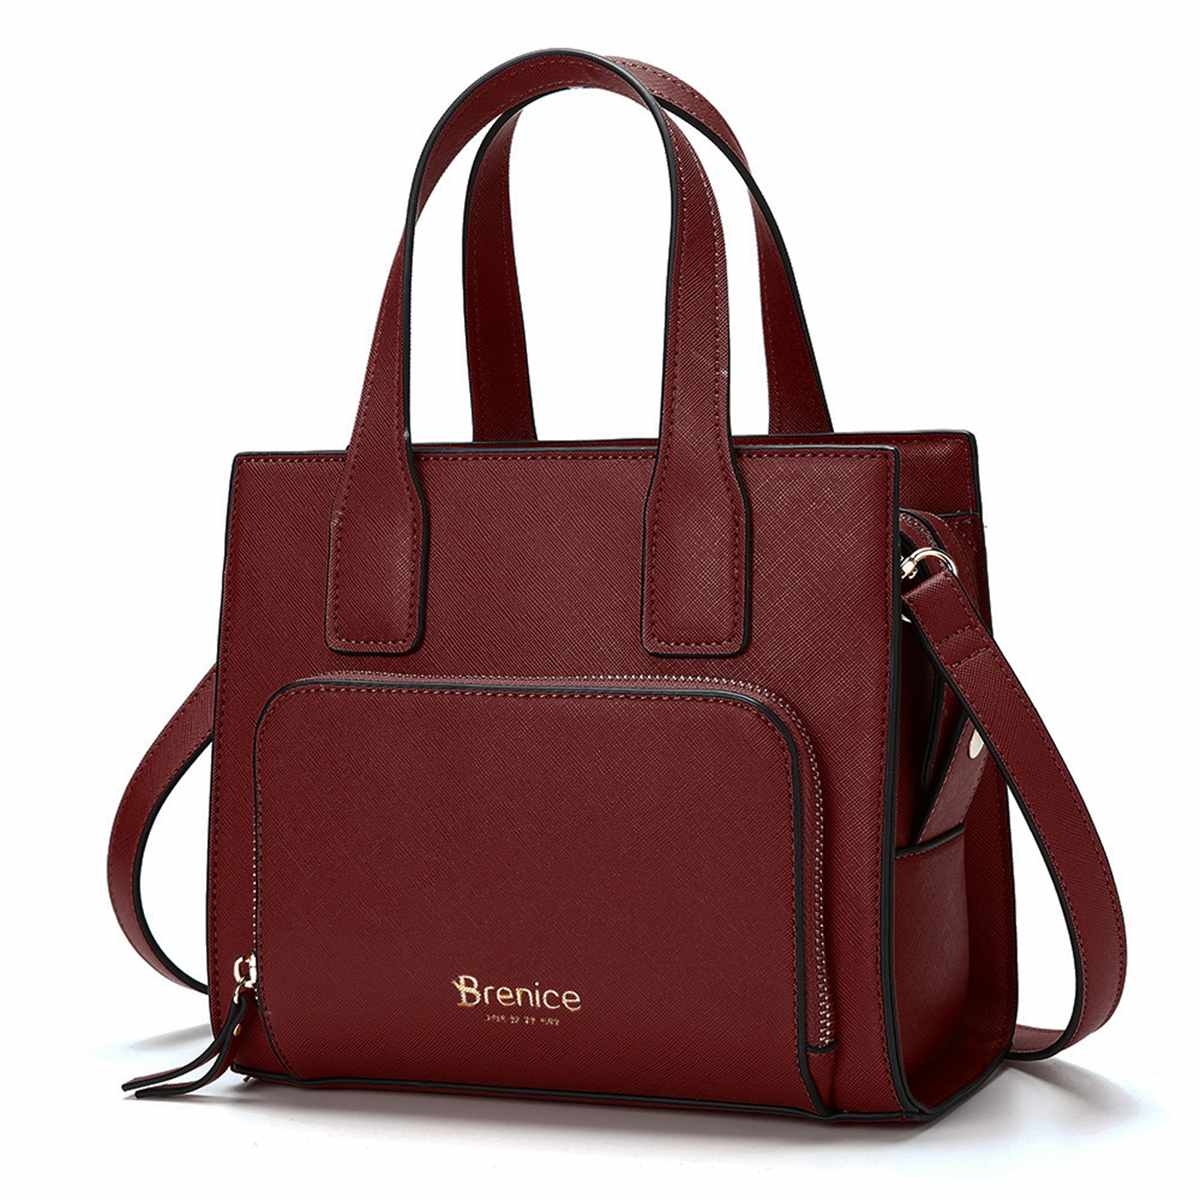 New Women Hand Bag Fashion Women Handbag Female Organize Bag Leather Multifunction Shoulder Bag Crossbody Bag Feminine Bolsa